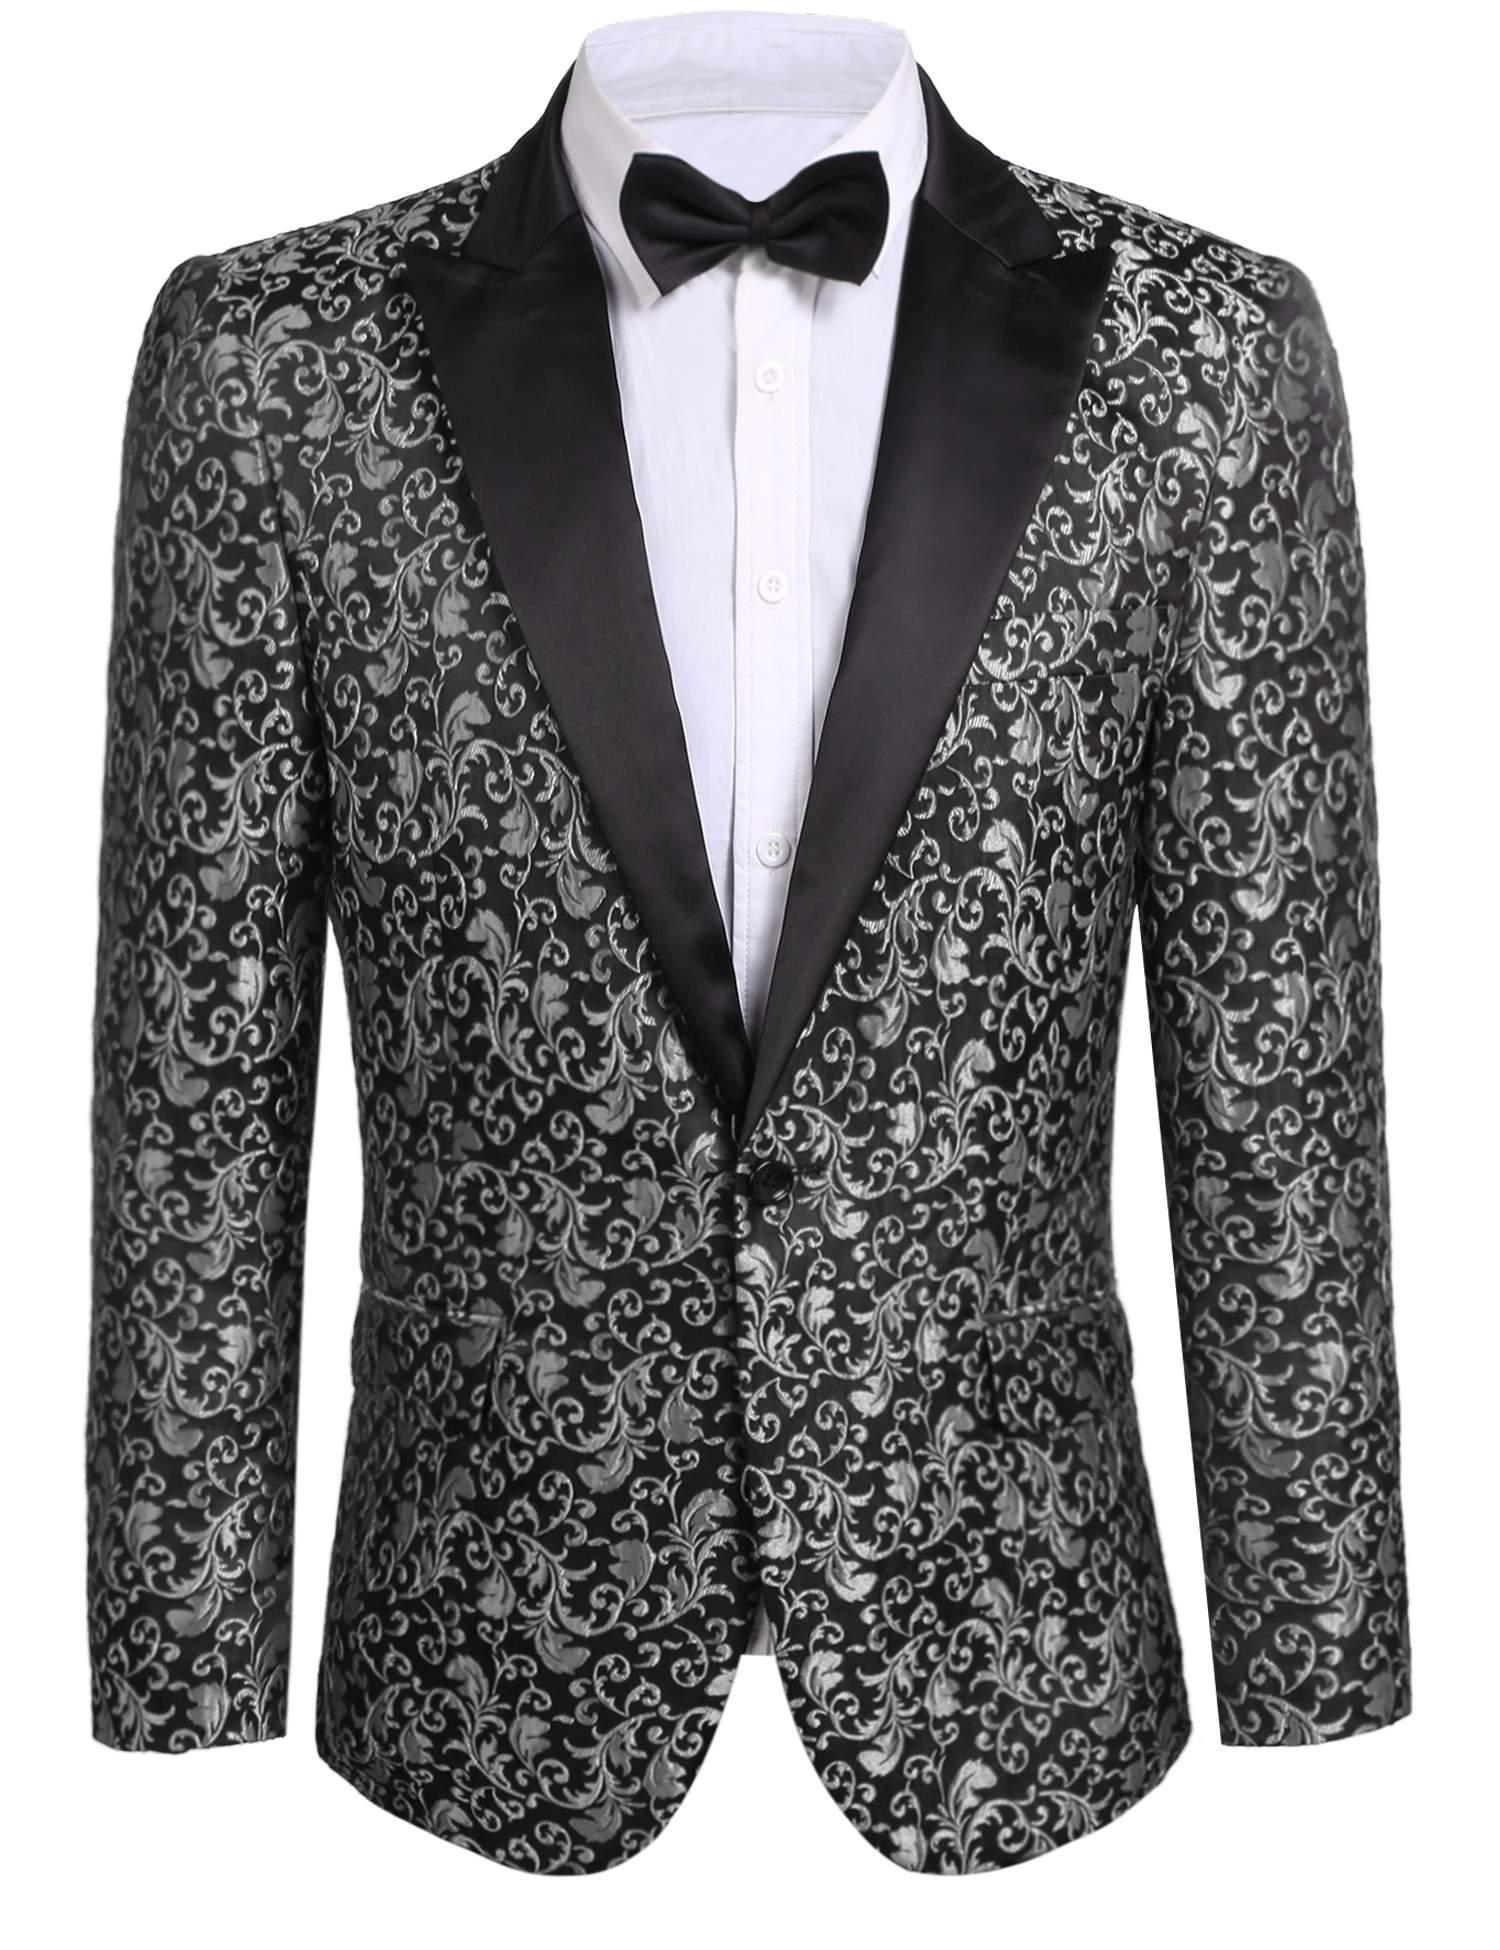 JINIDU Men's Floral Party Dress Suit Stylish Dinner Jacket Wedding Blazer Prom Tuxedo Gray by JINIDU